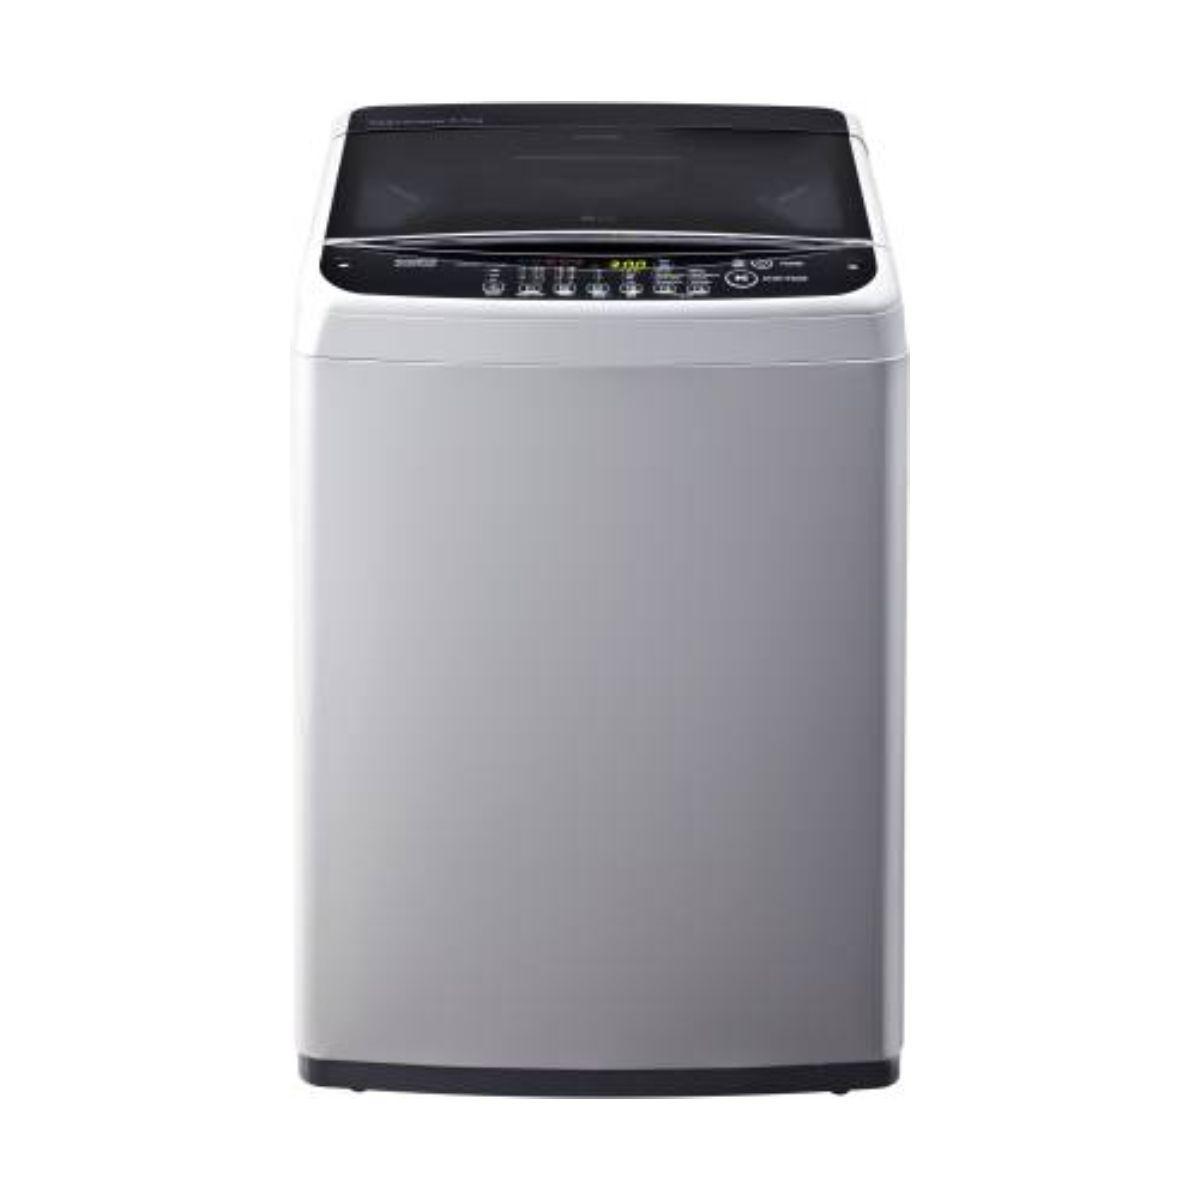 एलजी 6.5 kg Inverter Fully-Automatic टॉप Loading Washing Machine Silver (T7581NDDLG)